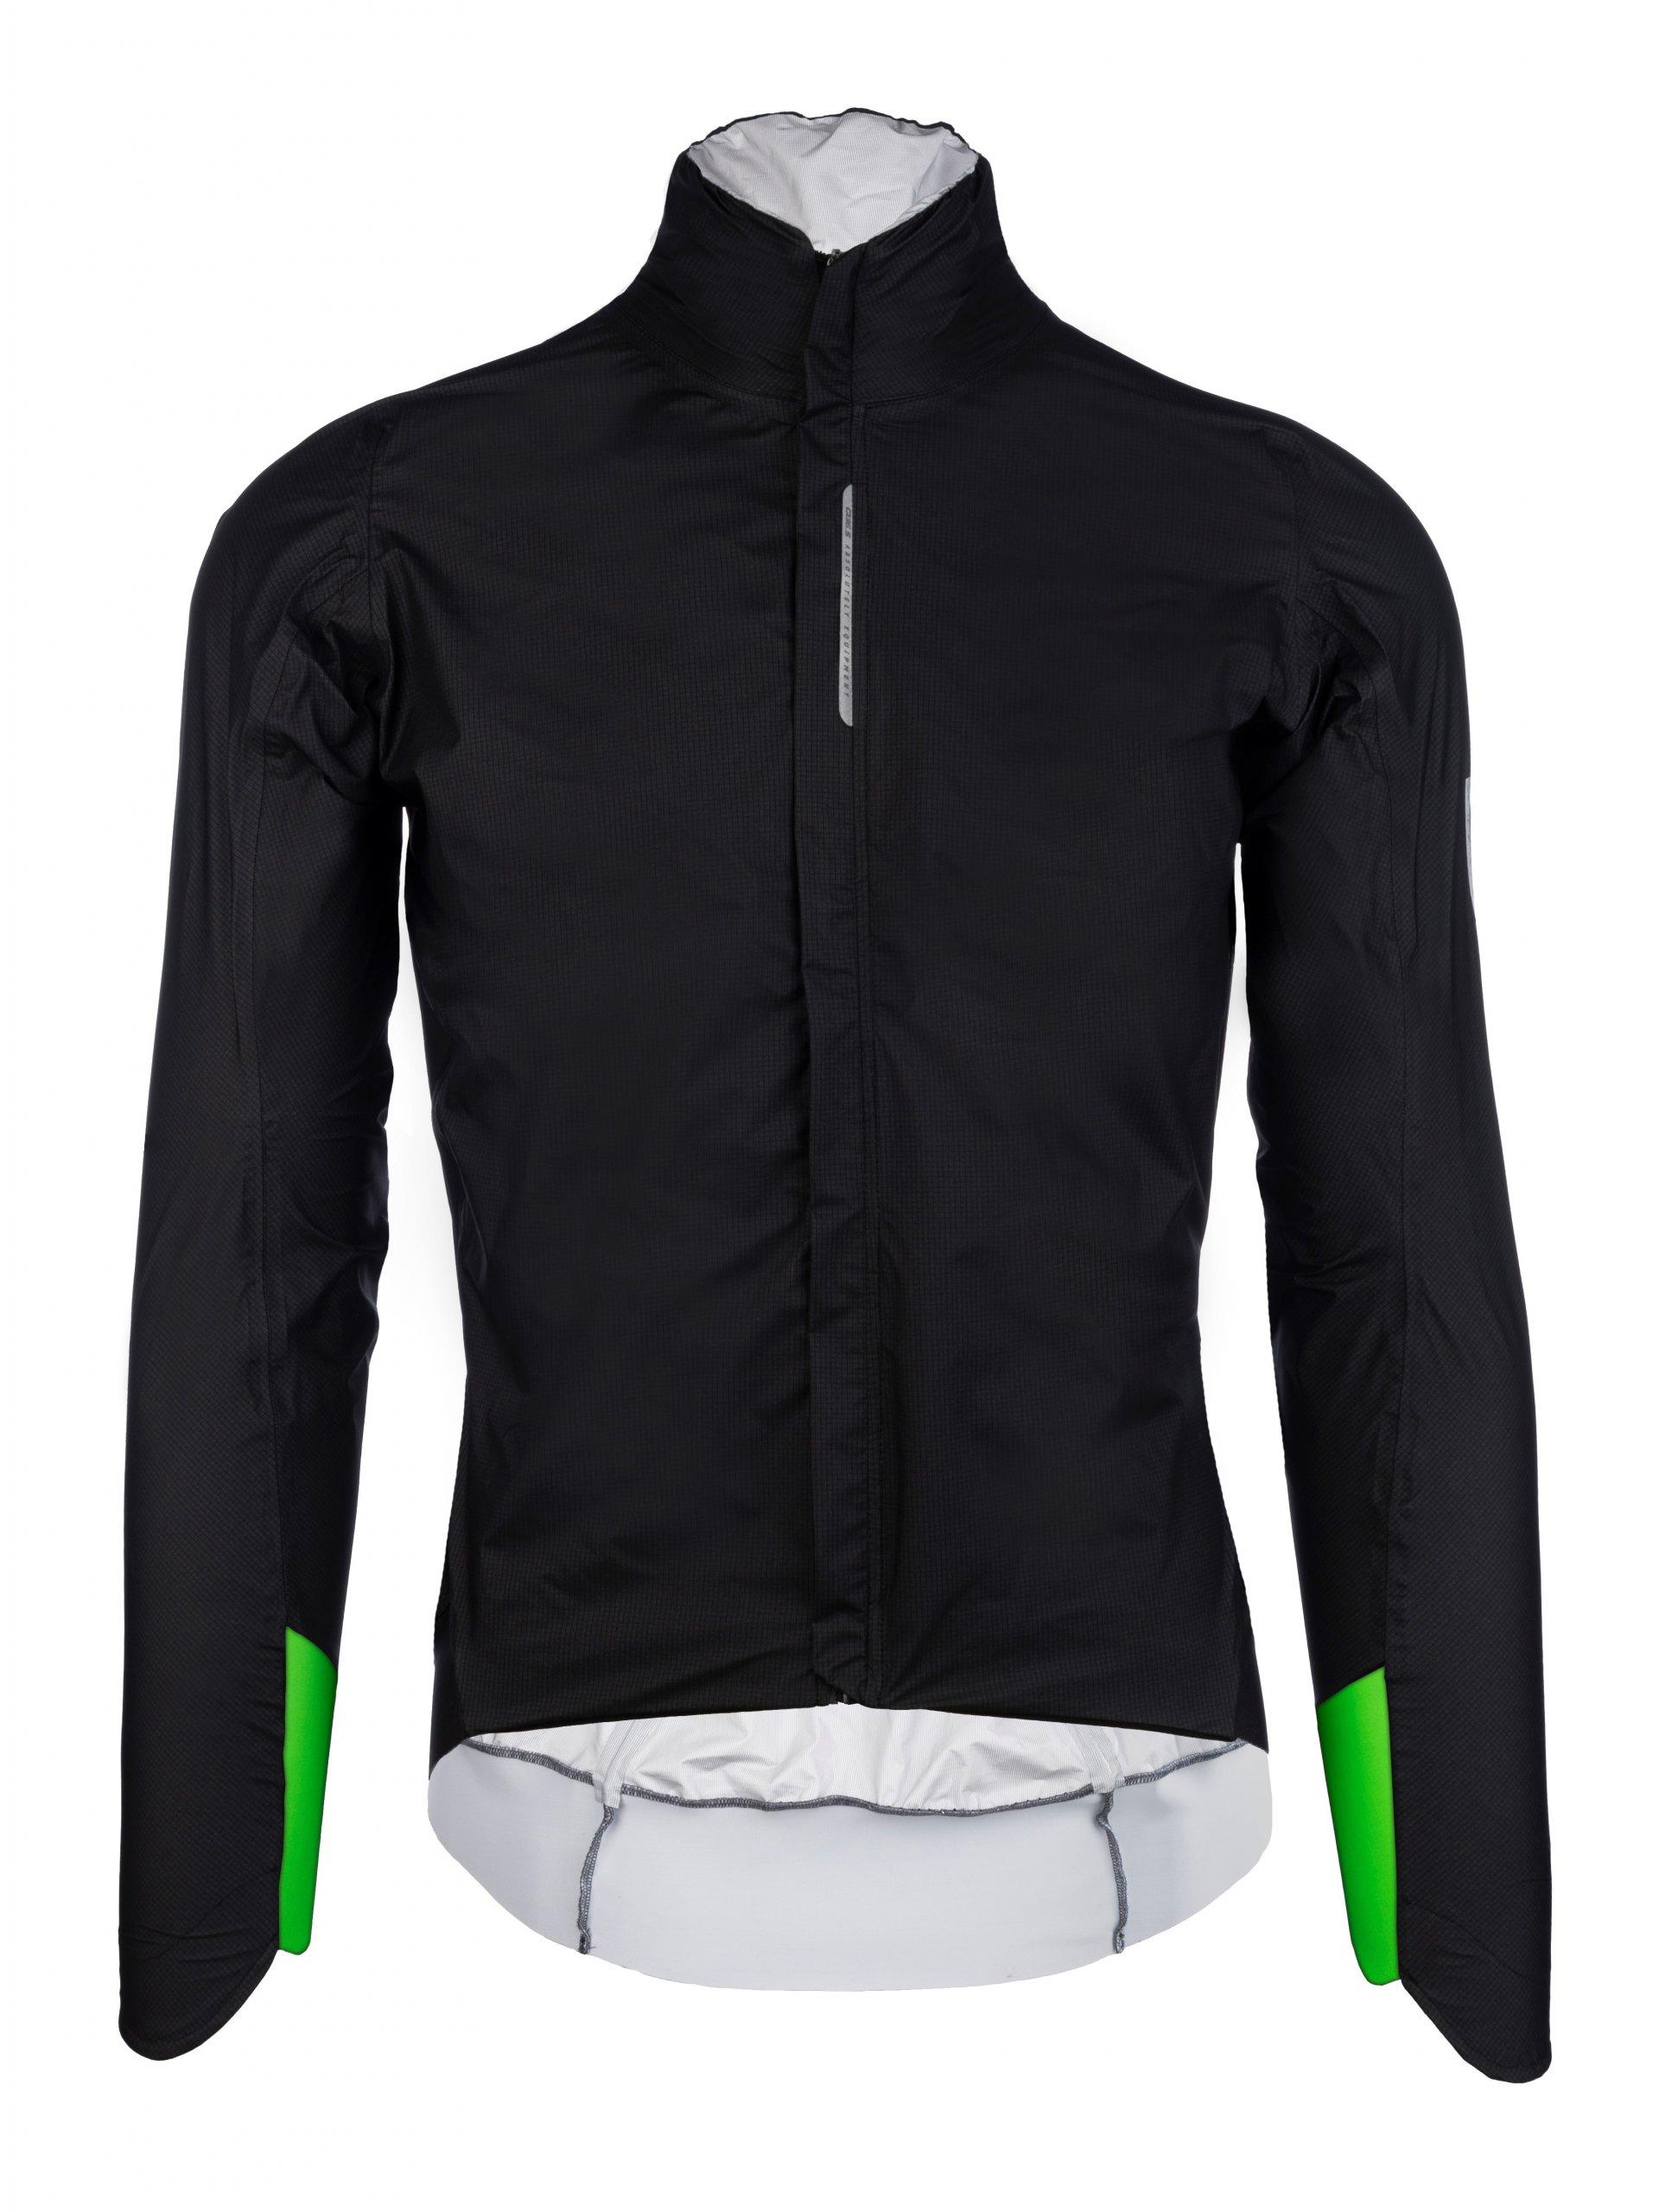 cycling rain jacket black R.Shell Protection X